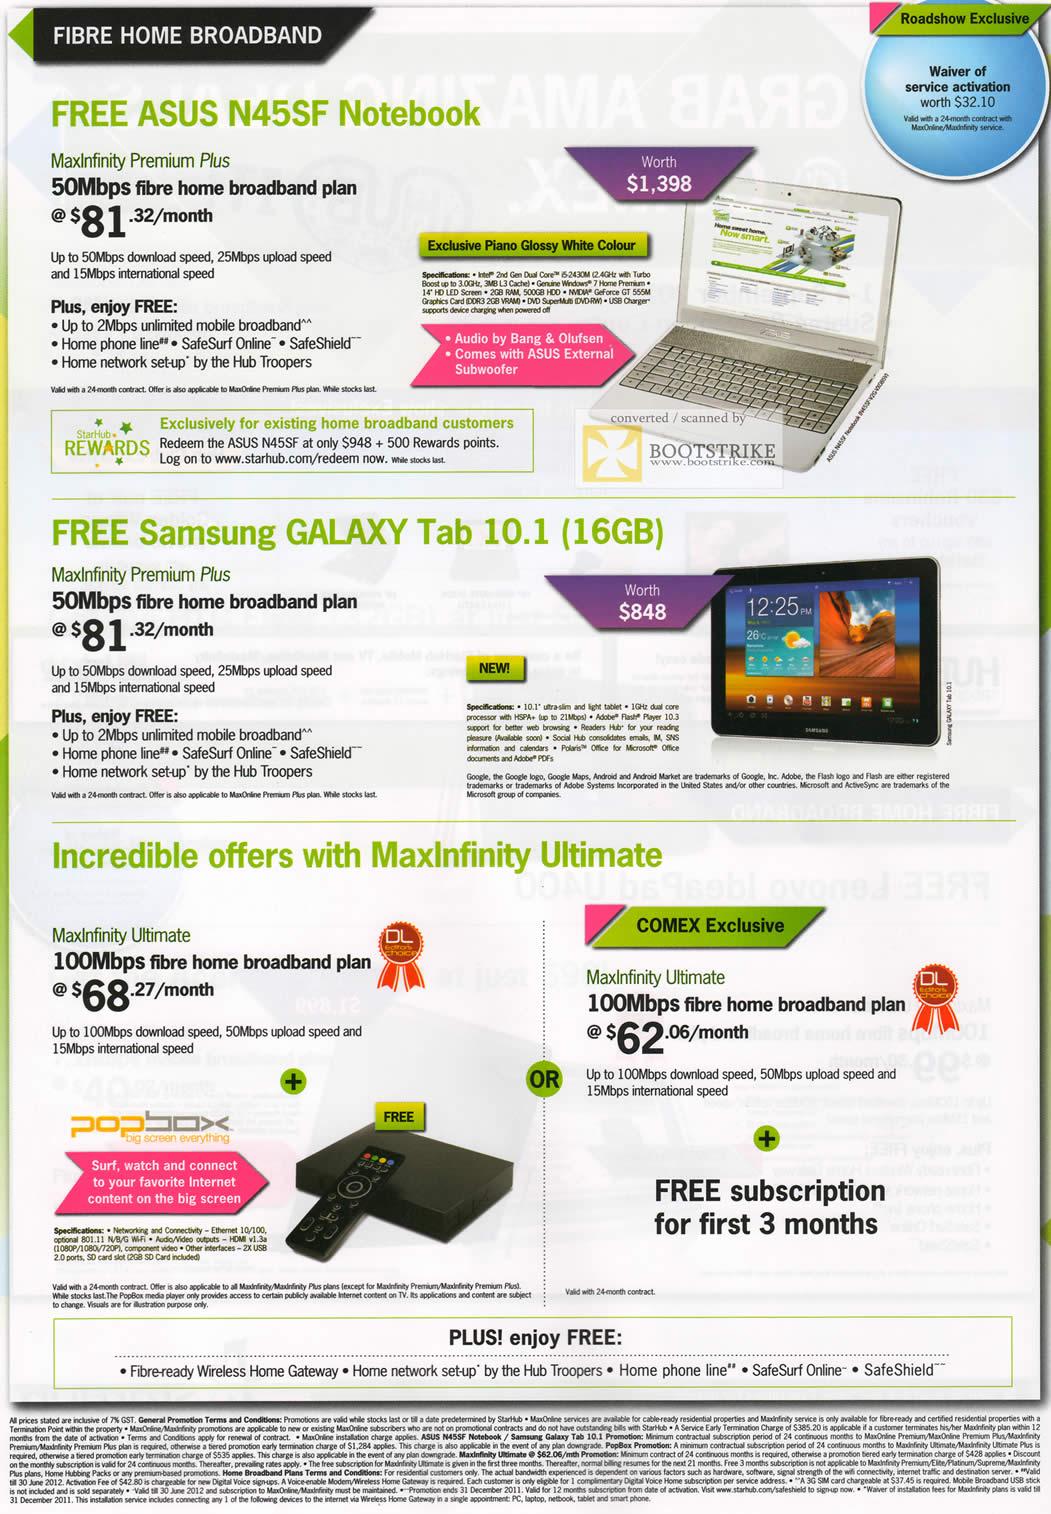 COMEX 2011 price list image brochure of Starhub Fibre Home Broadband MaxInfinity Premium Plus Free ASUS N45SF Notebook Samsung Galaxy Tab 10.1 16GB Popbox Ultimate